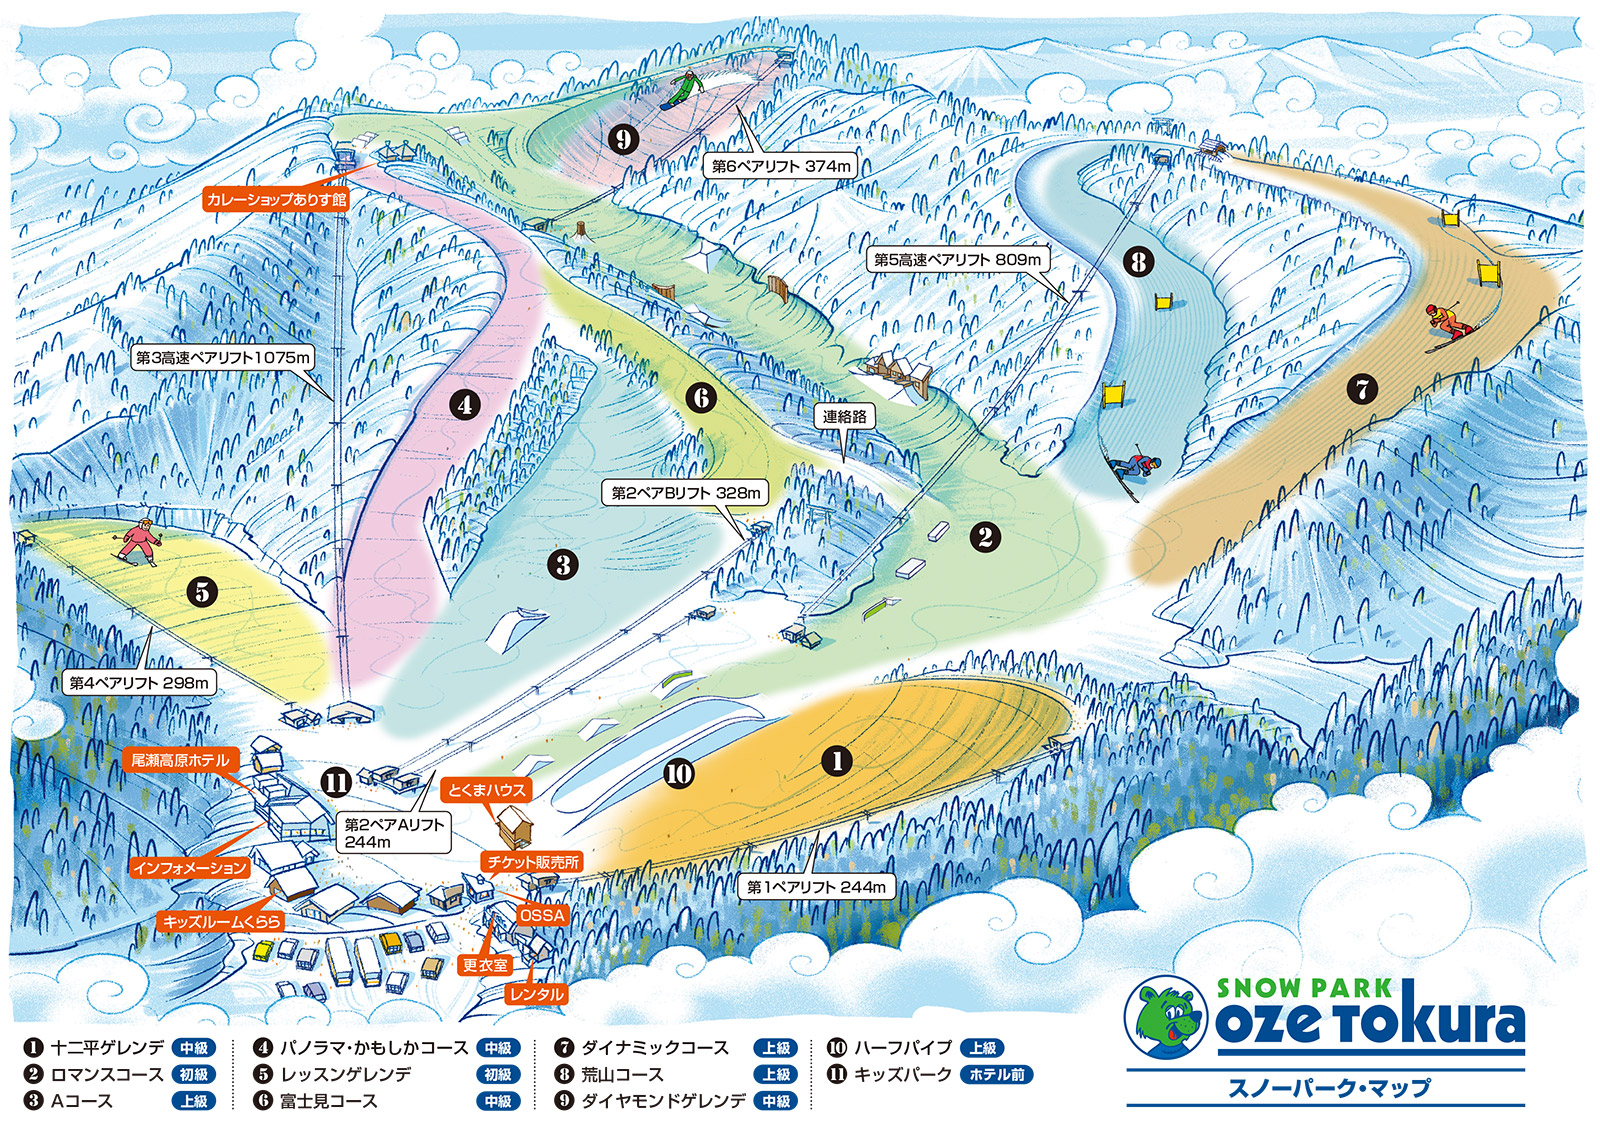 Oze Tokura Piste / Trail Map